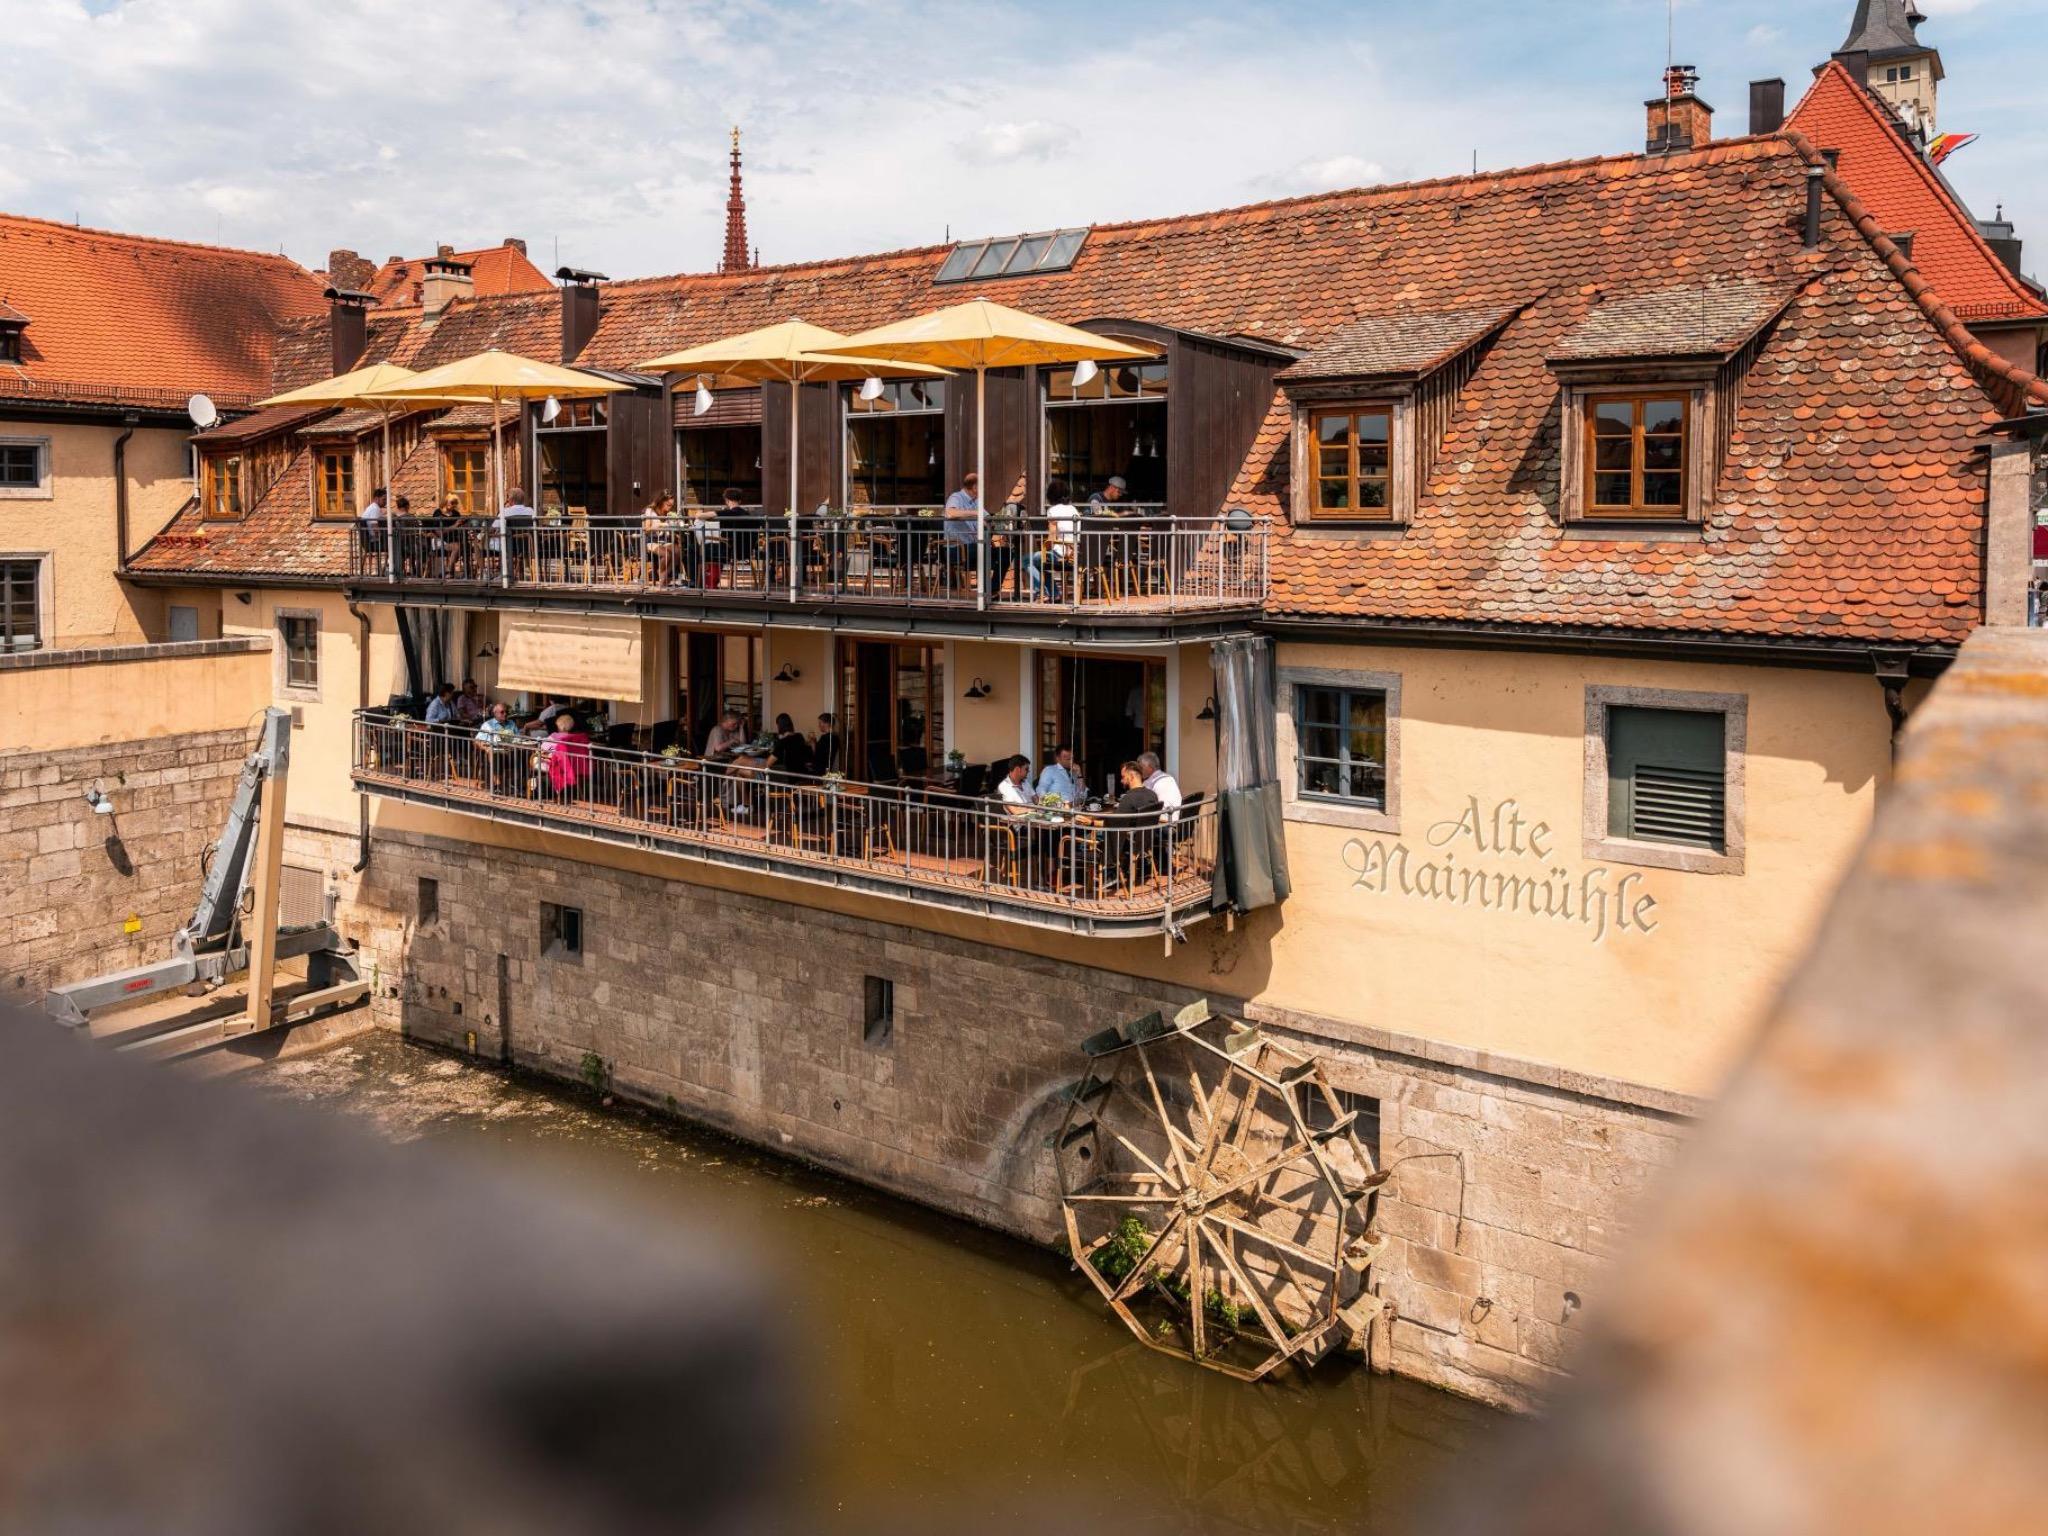 Die Alte Mainmühle in Würzburg sucht Personal! Foto: Jonas Blank